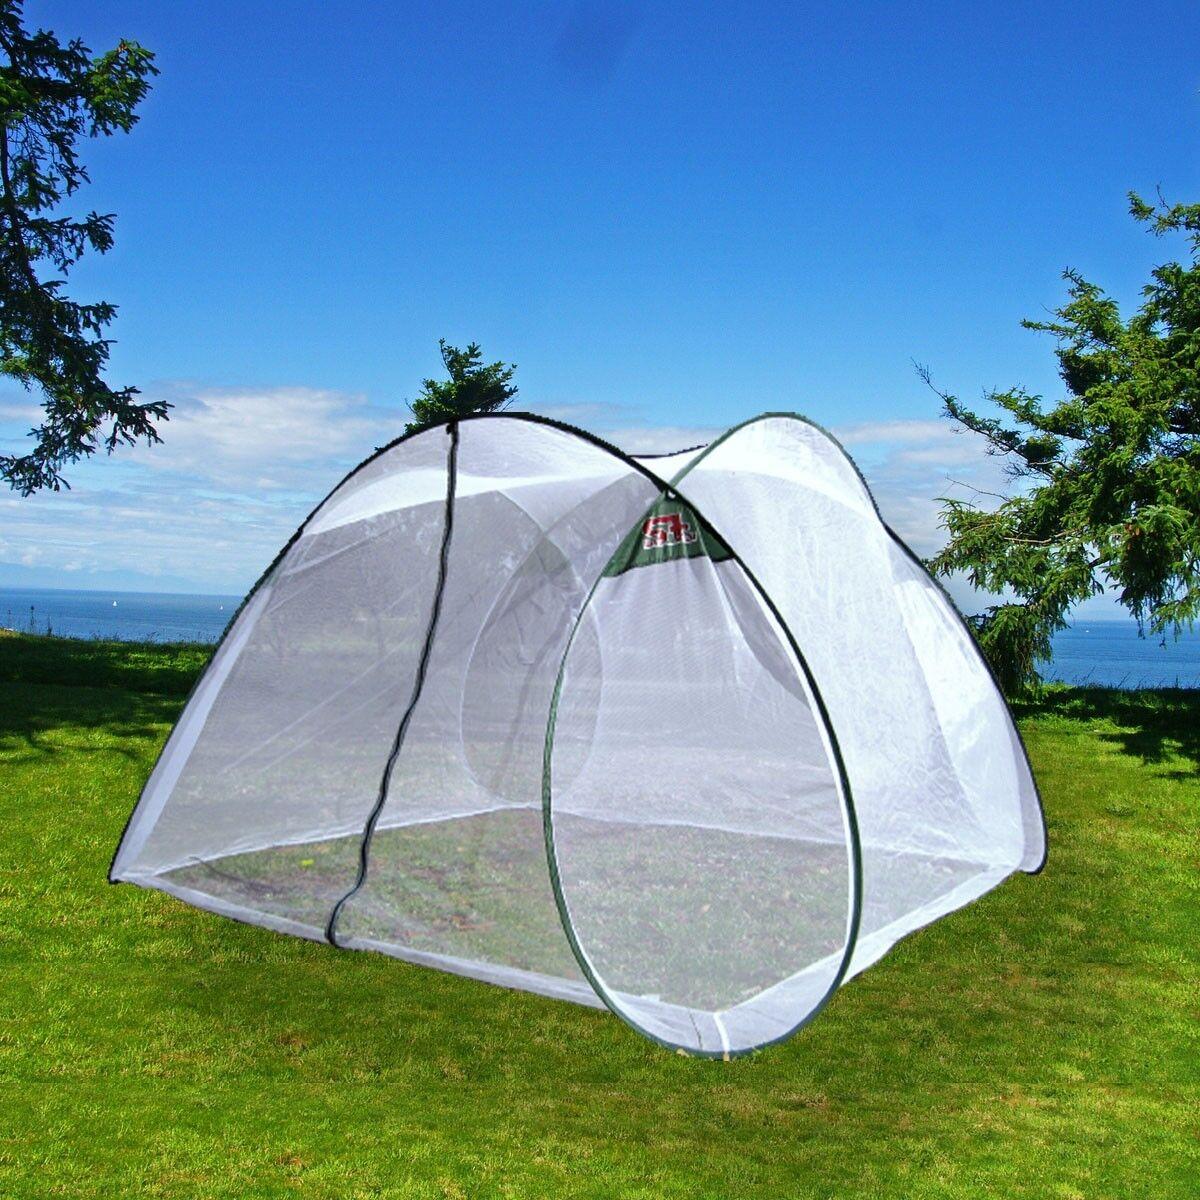 Portable Foldable Insektenschutz Anti-Bug 45 Person Mosquito Net Tent